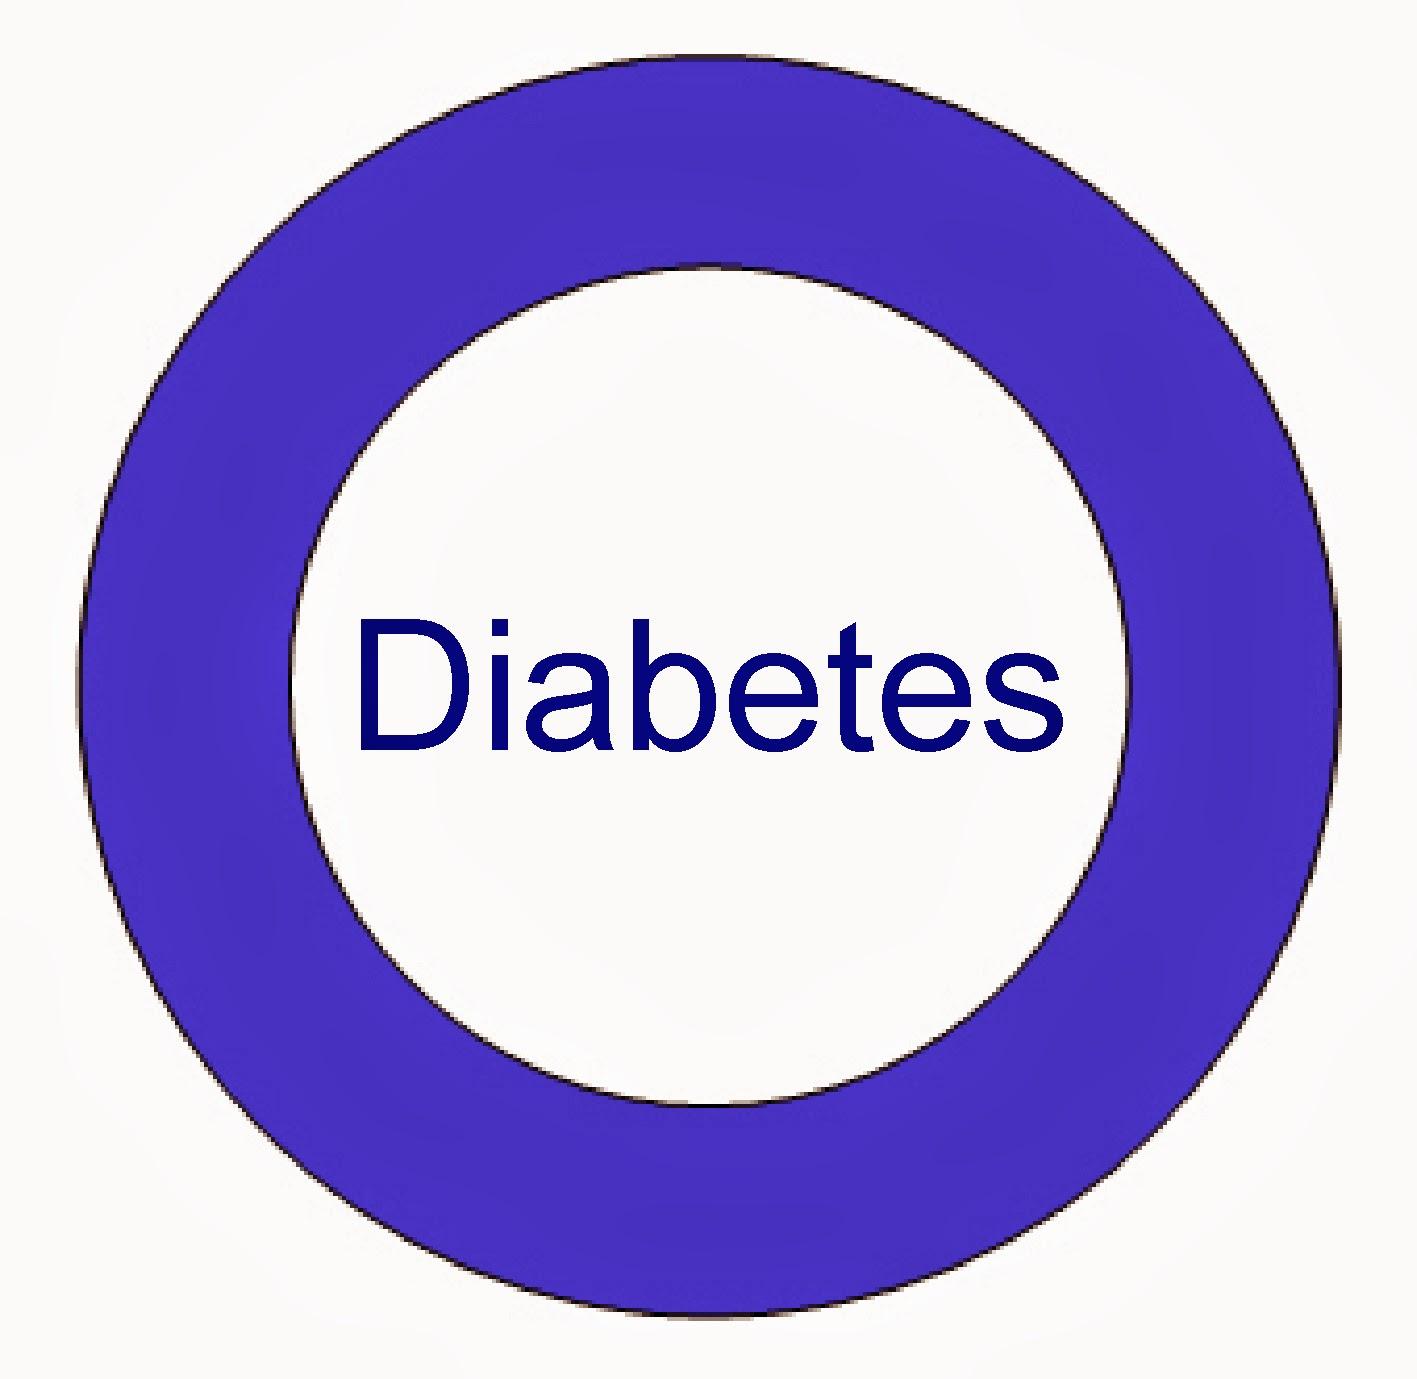 Símbolo de la Diabetes